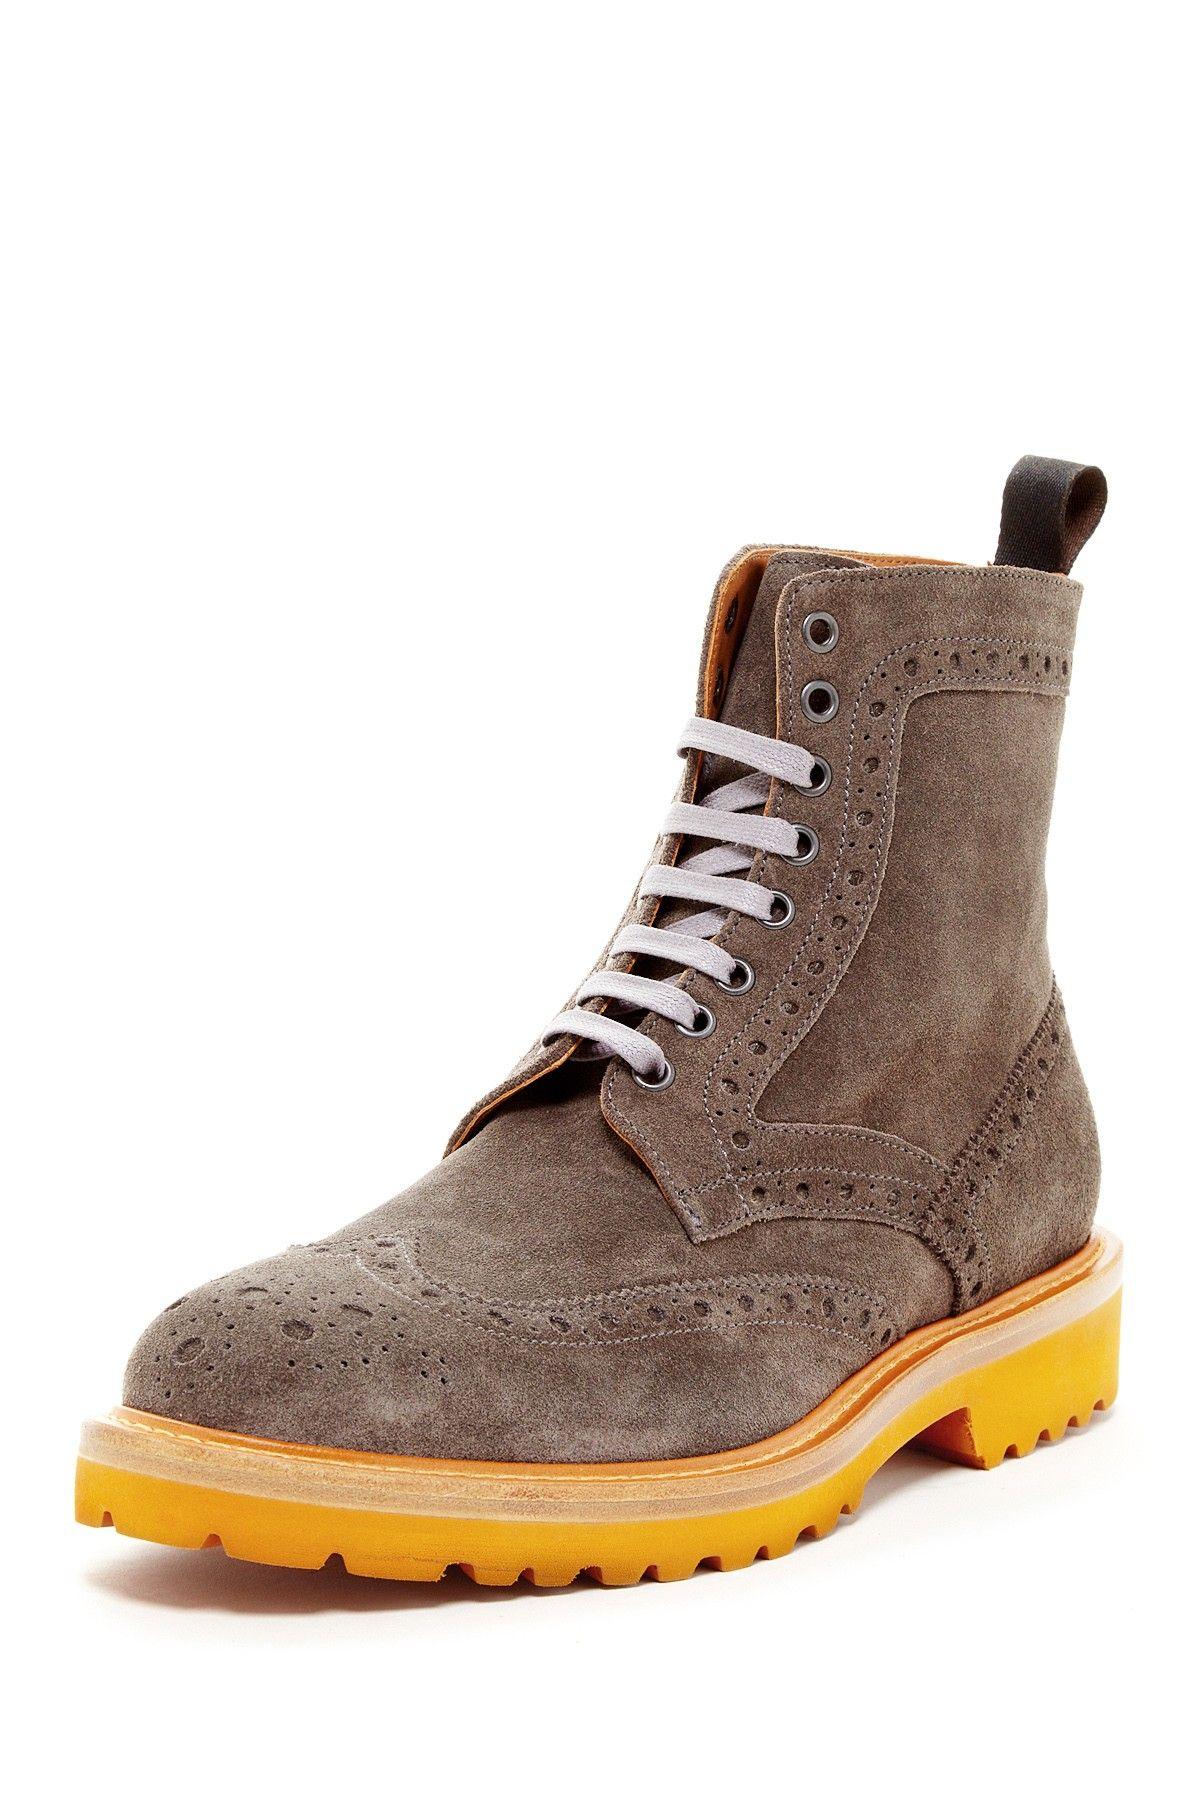 879748a7554 Thomas Dean Lug Sole Suede Wingtip Boot | Shoes - Lug Sole | Fashion ...